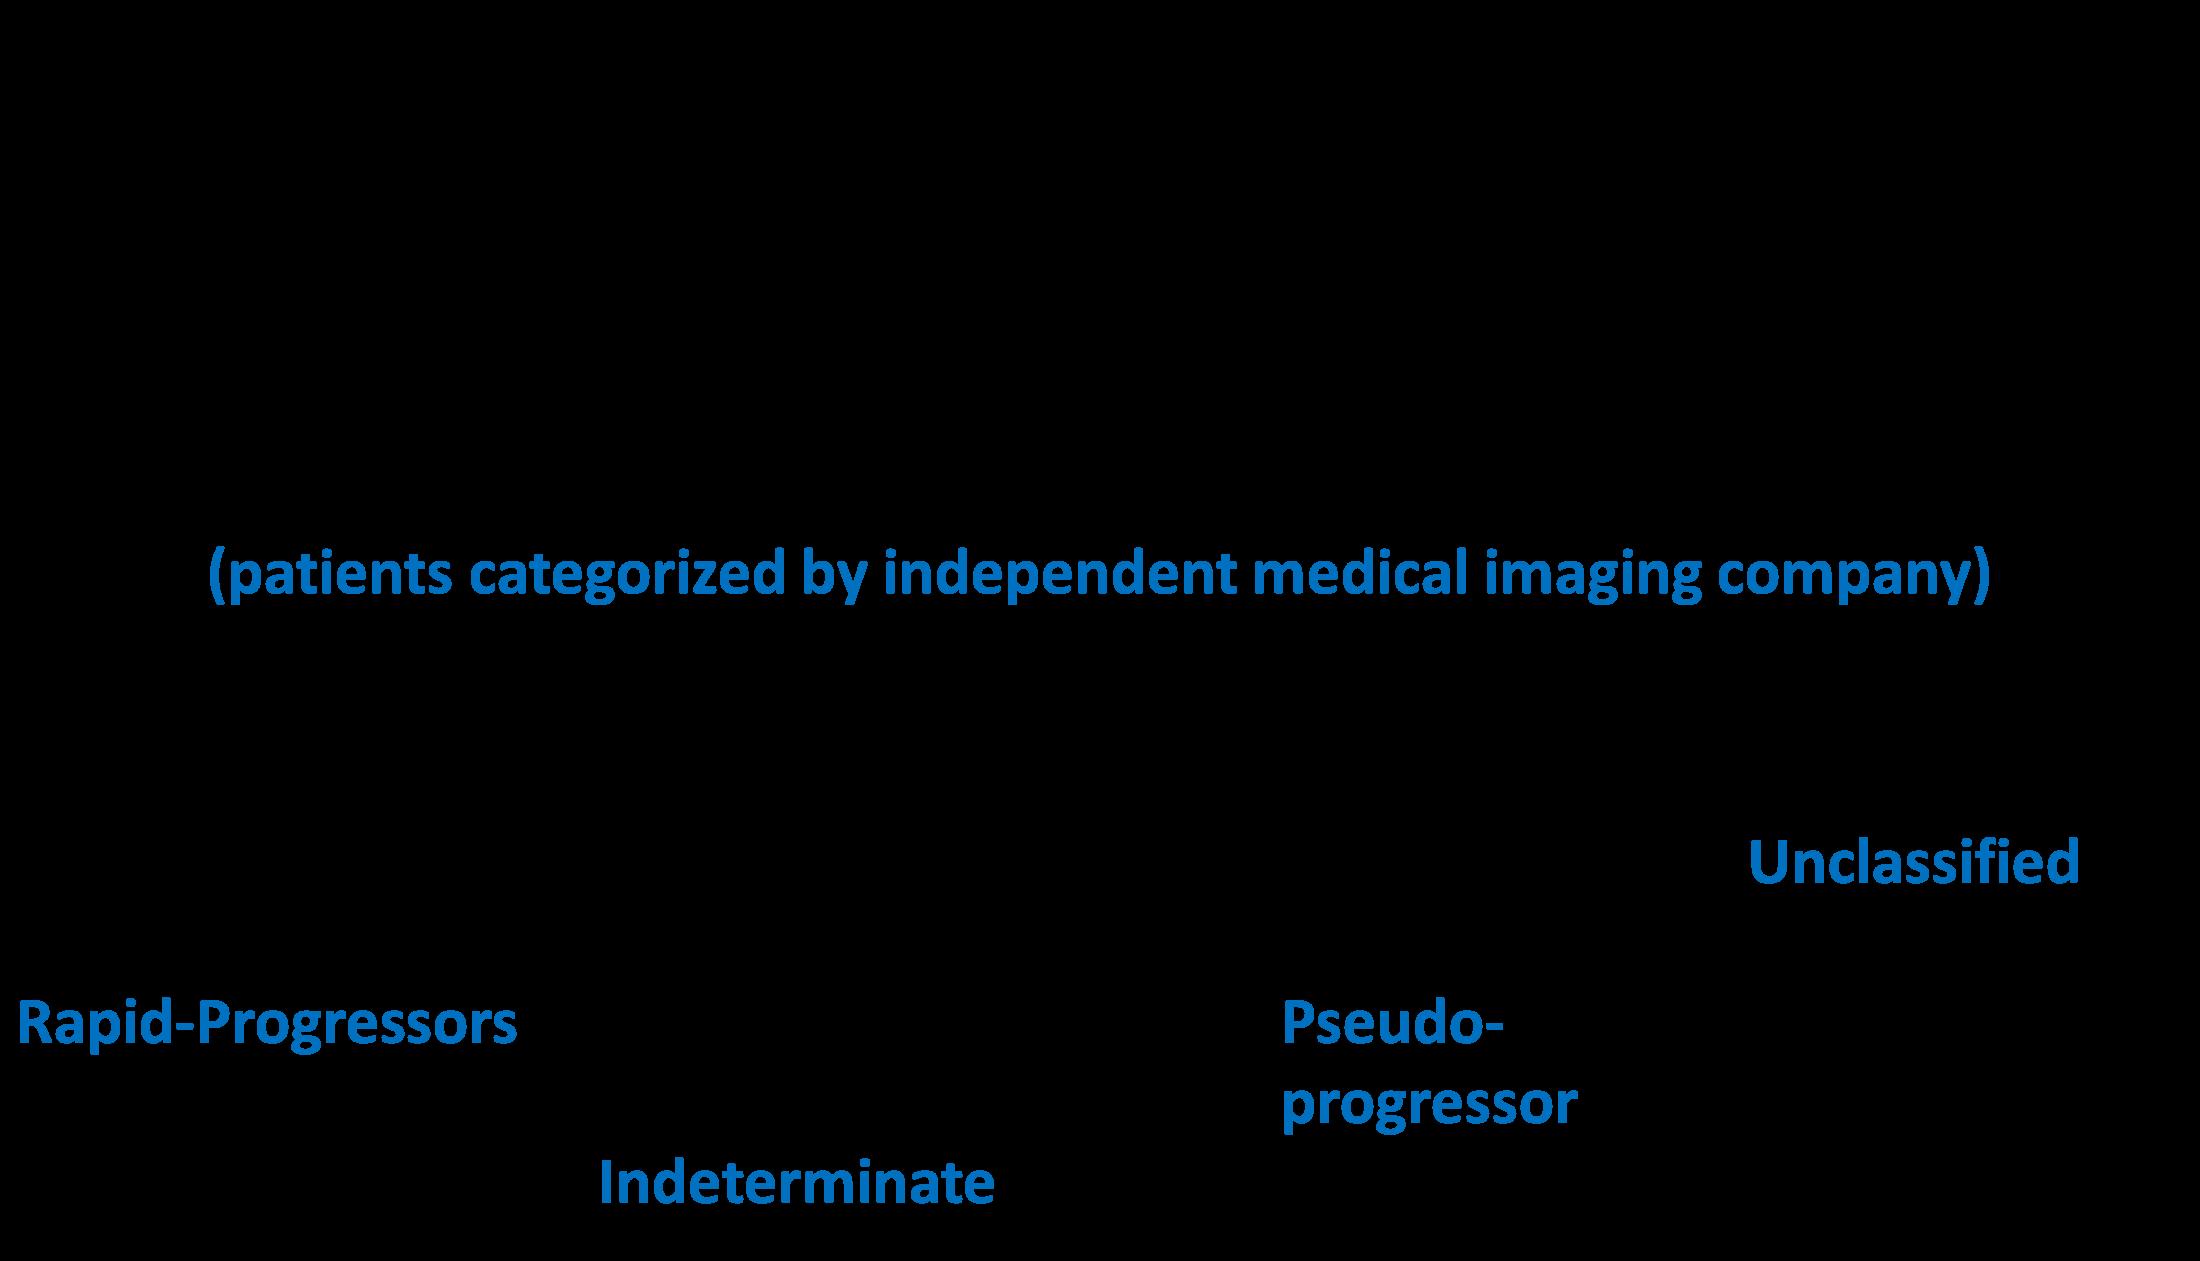 nwb_categorization_of_patients